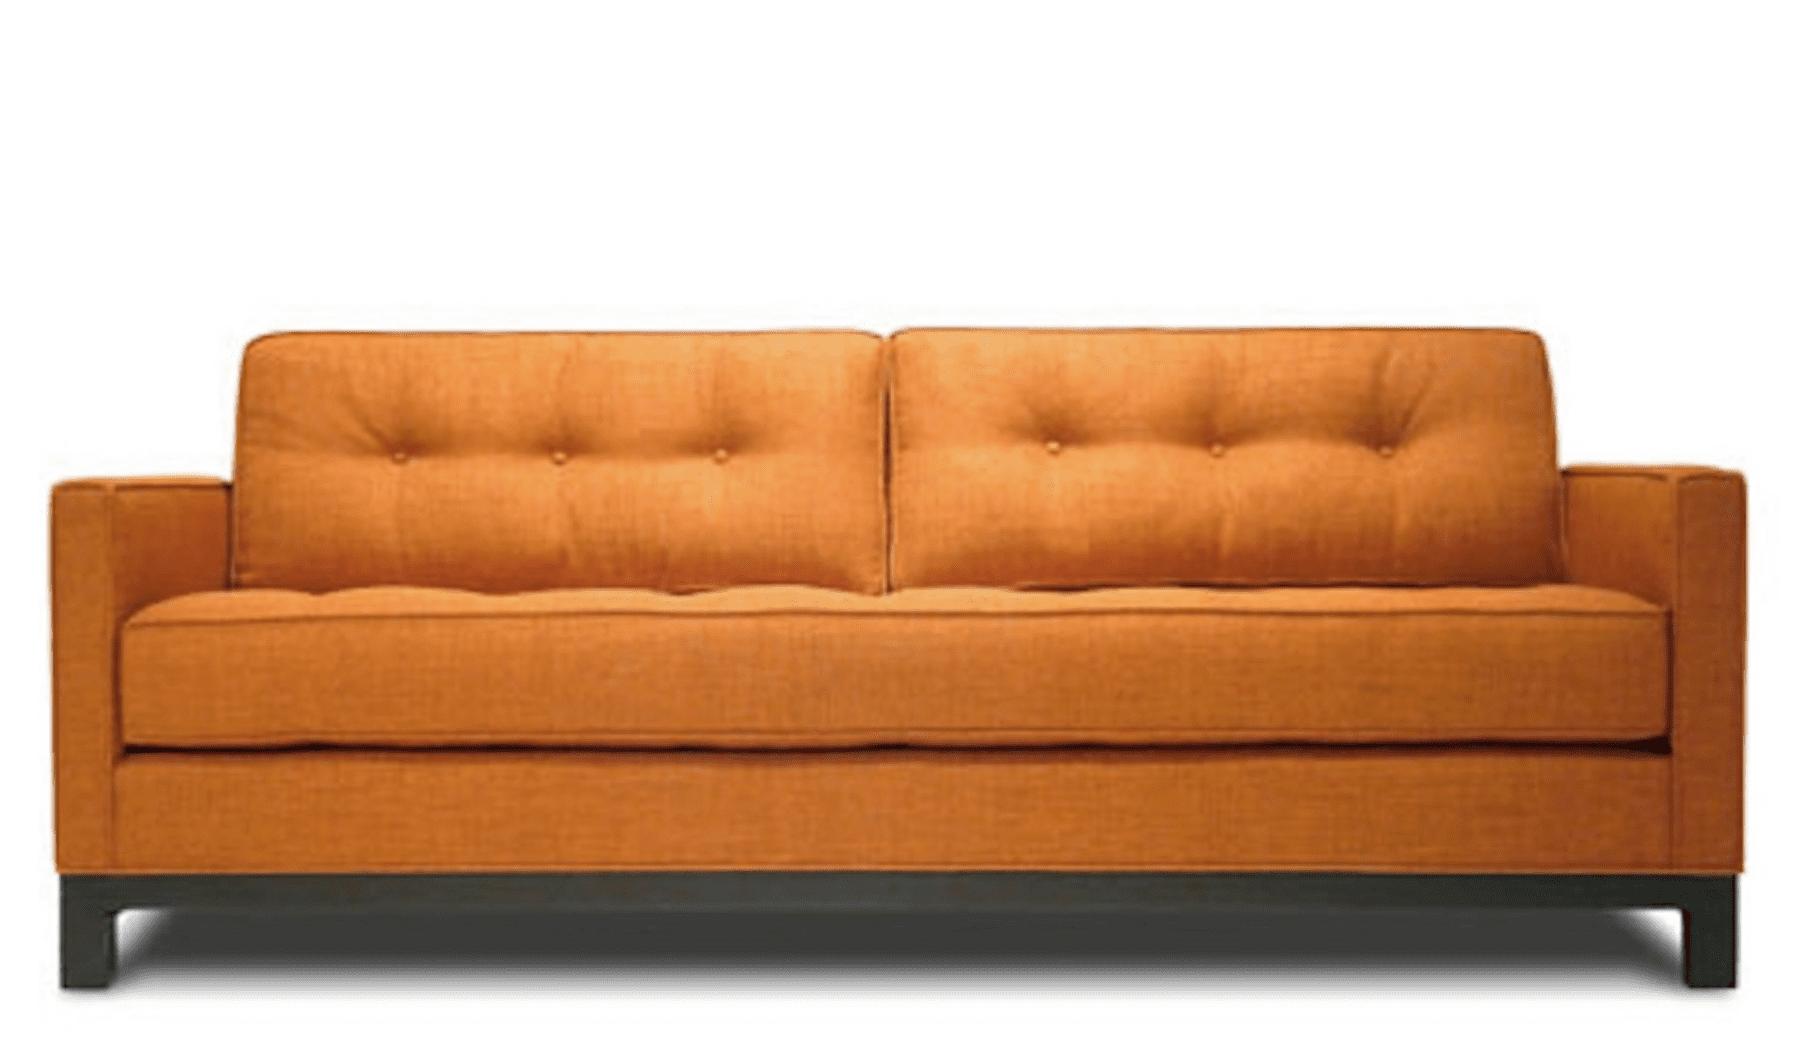 10 stunning mid century modern sofas for Mid century modern sofas